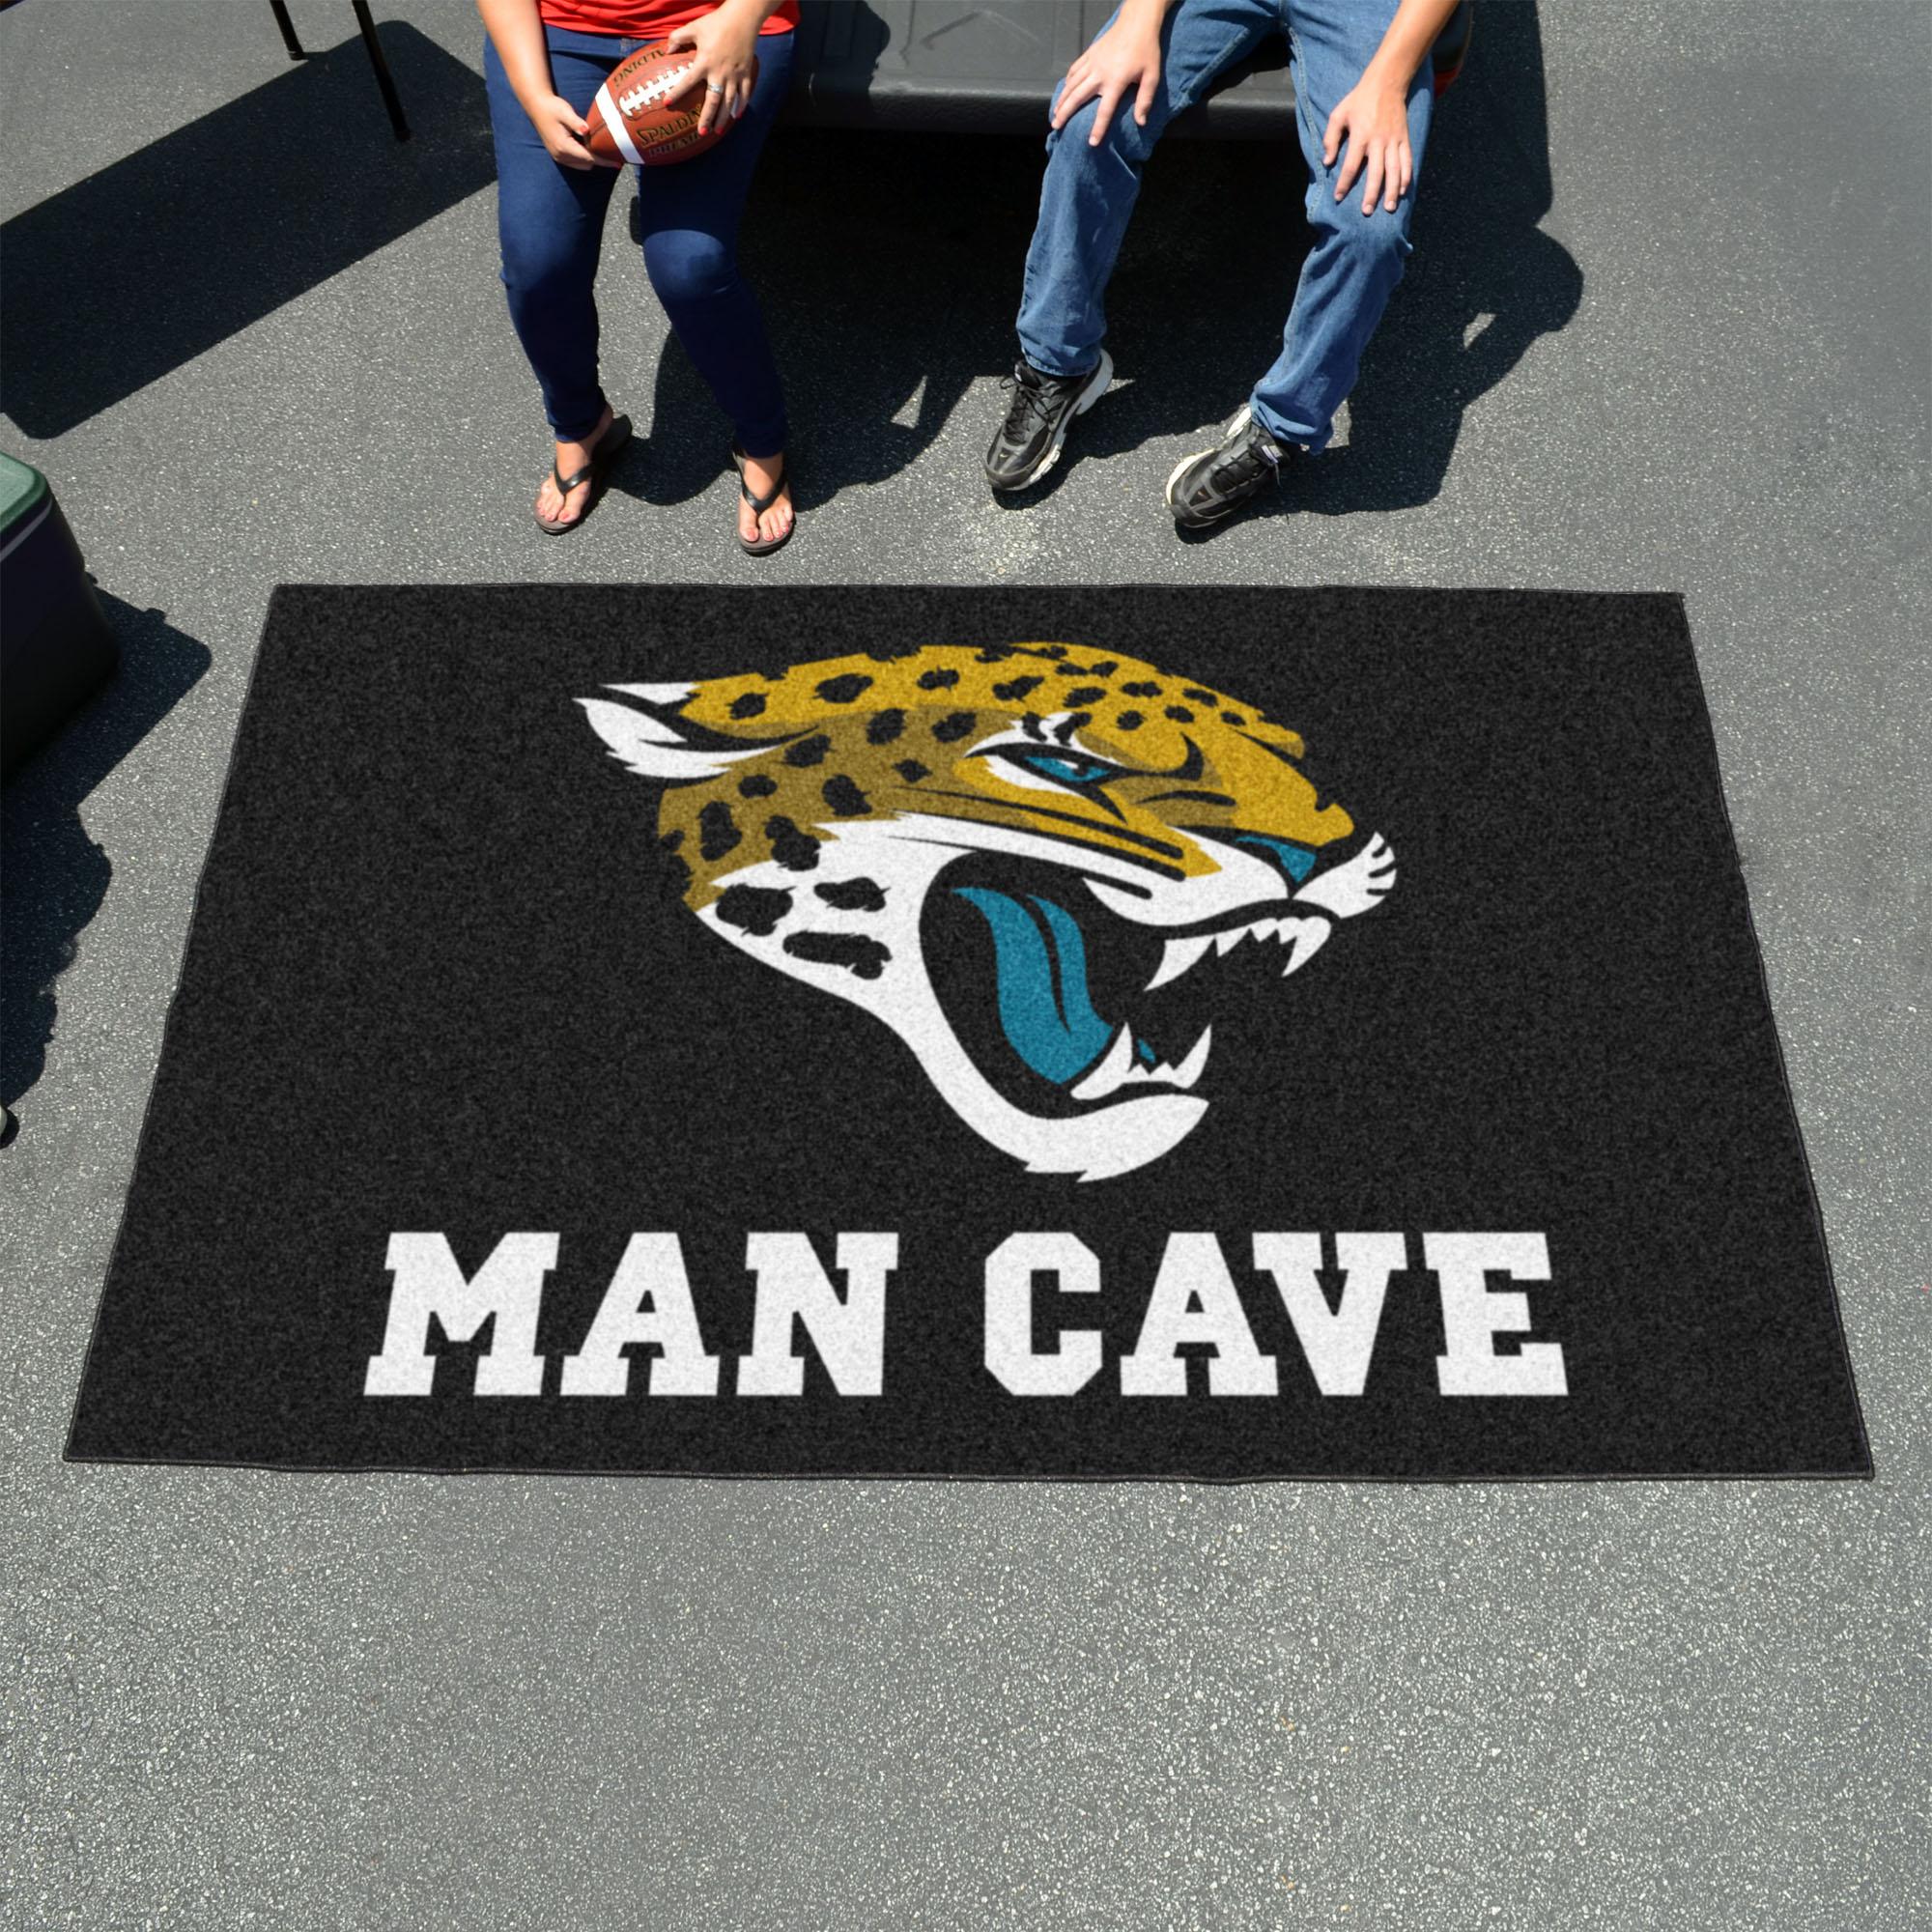 Jacksonville Jaguars Utili Mat 60 X 96 Man Cave Rug Buy